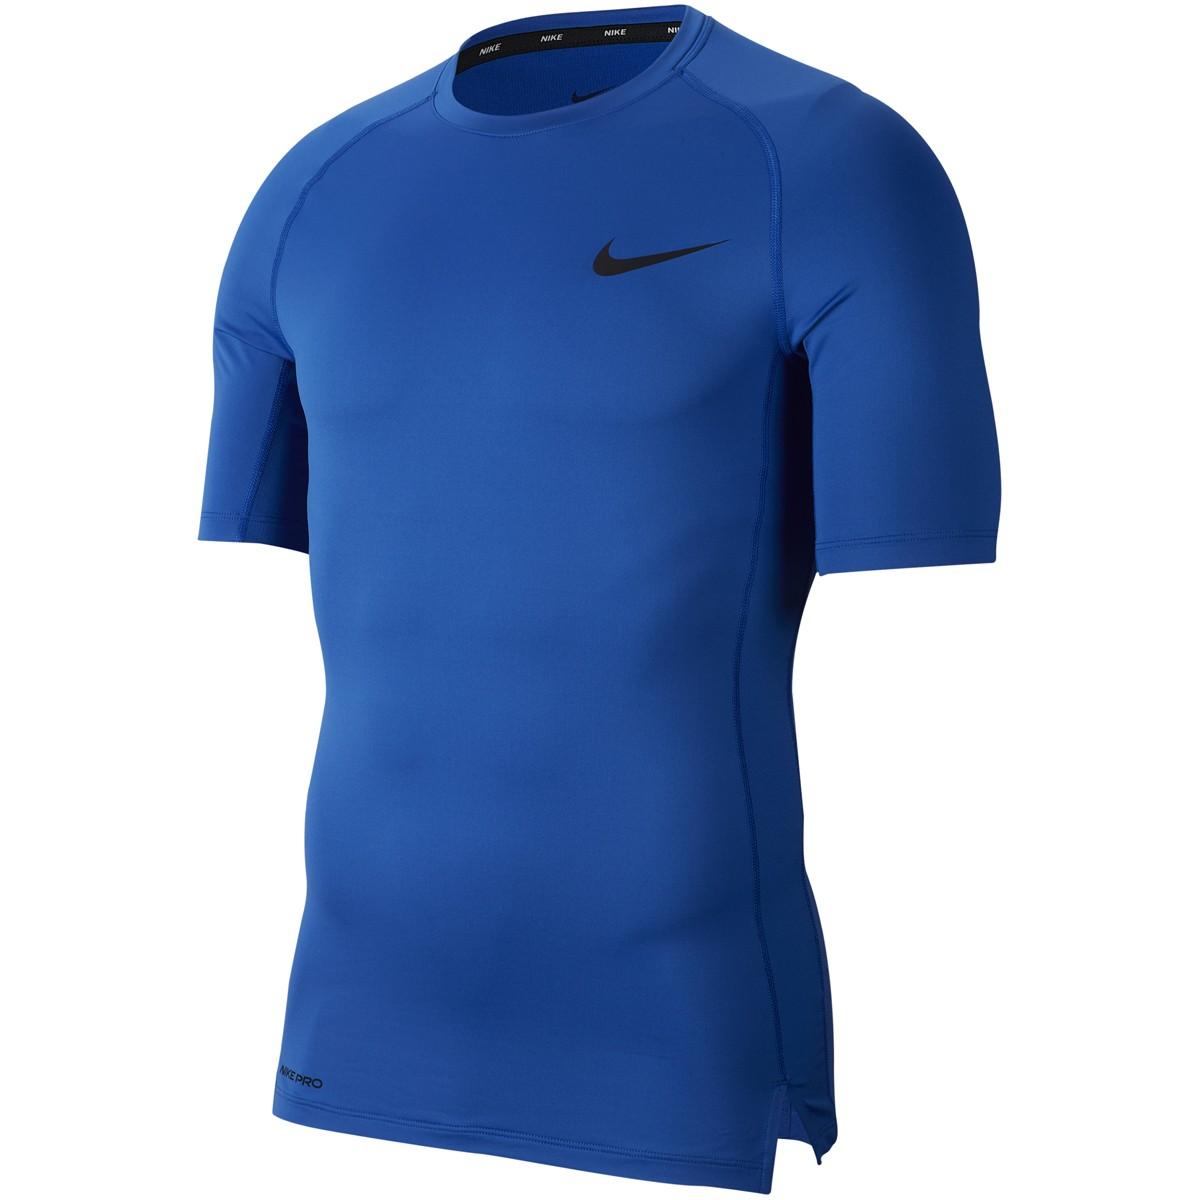 viceversa Persona Modales  NIKE PRO LOGO T-SHIRT - NIKE - Men's - Clothing   Tennispro